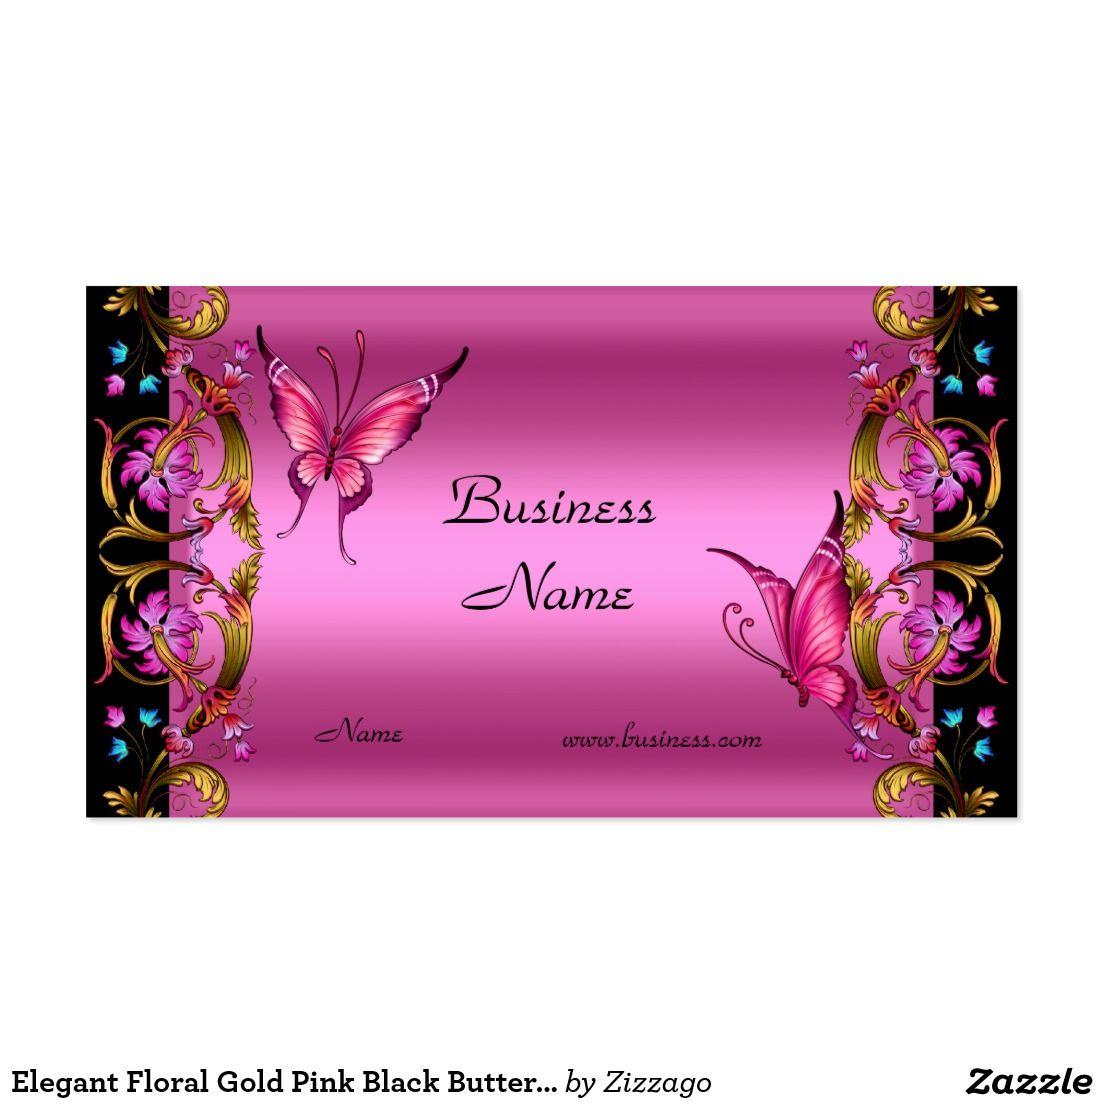 Elegant Floral Gold Pink Black Butterfly Business Card   Pink ...